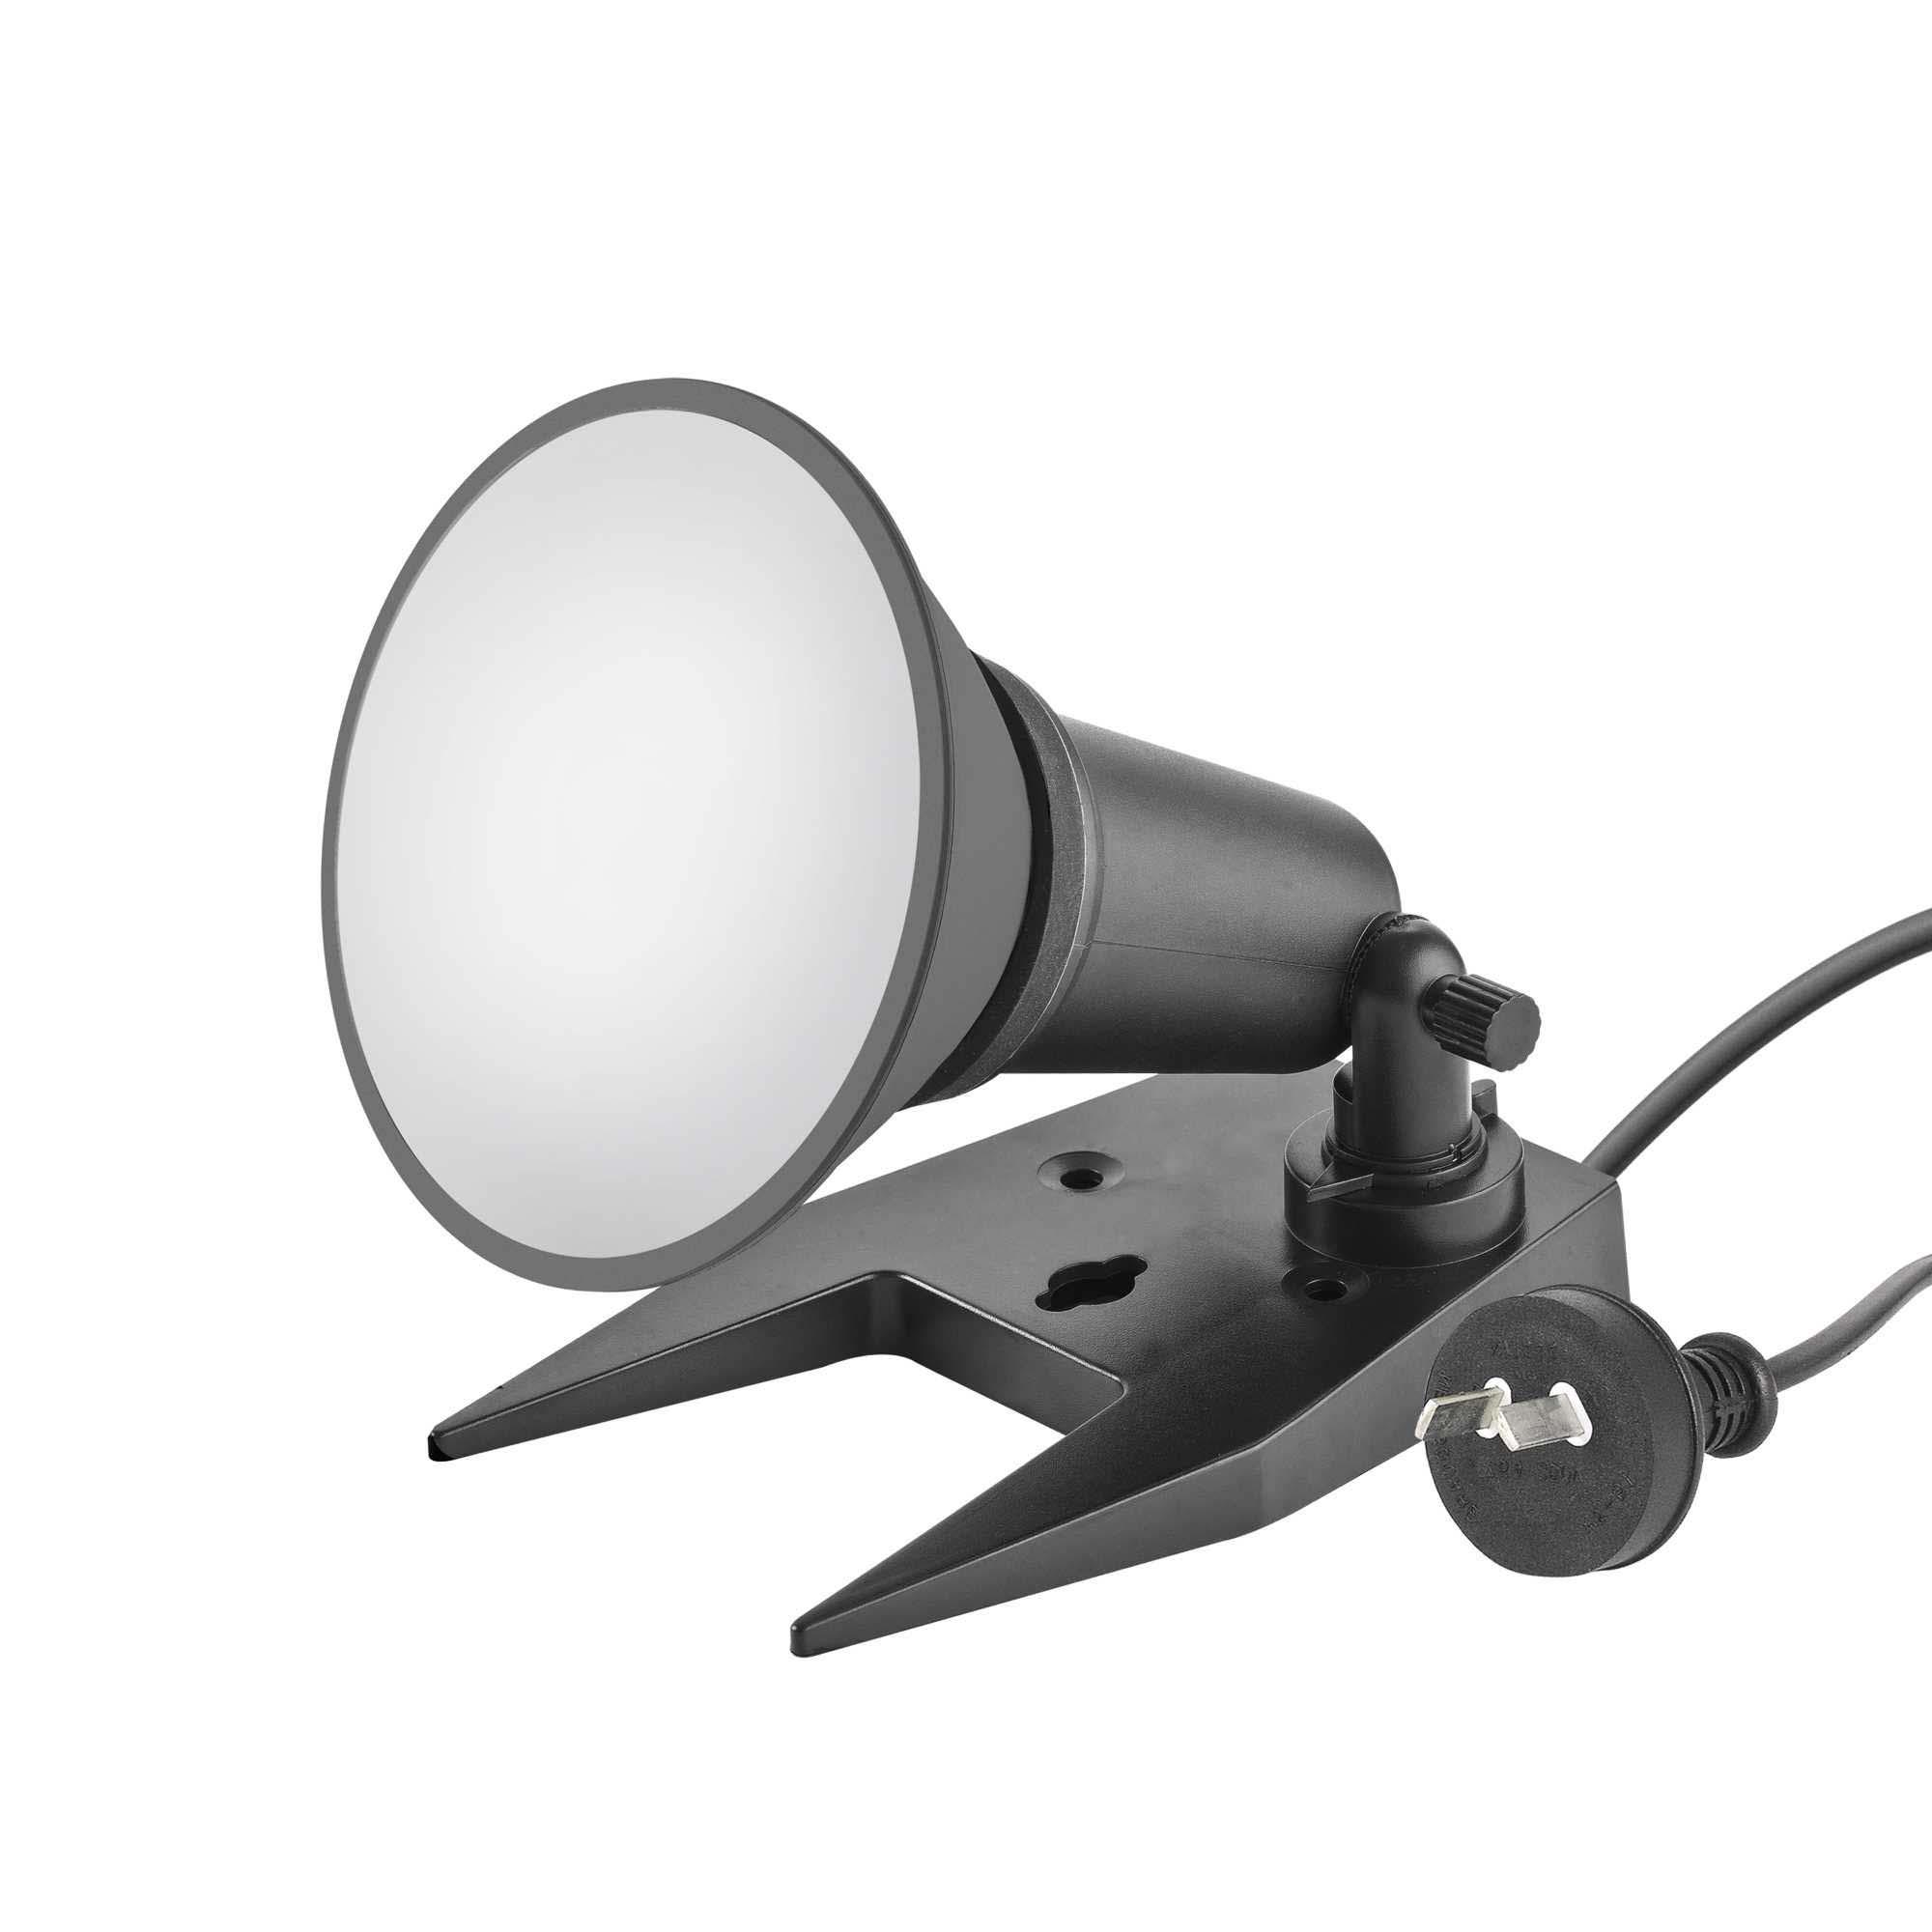 Black portable floodlight with 10w led par38 globe